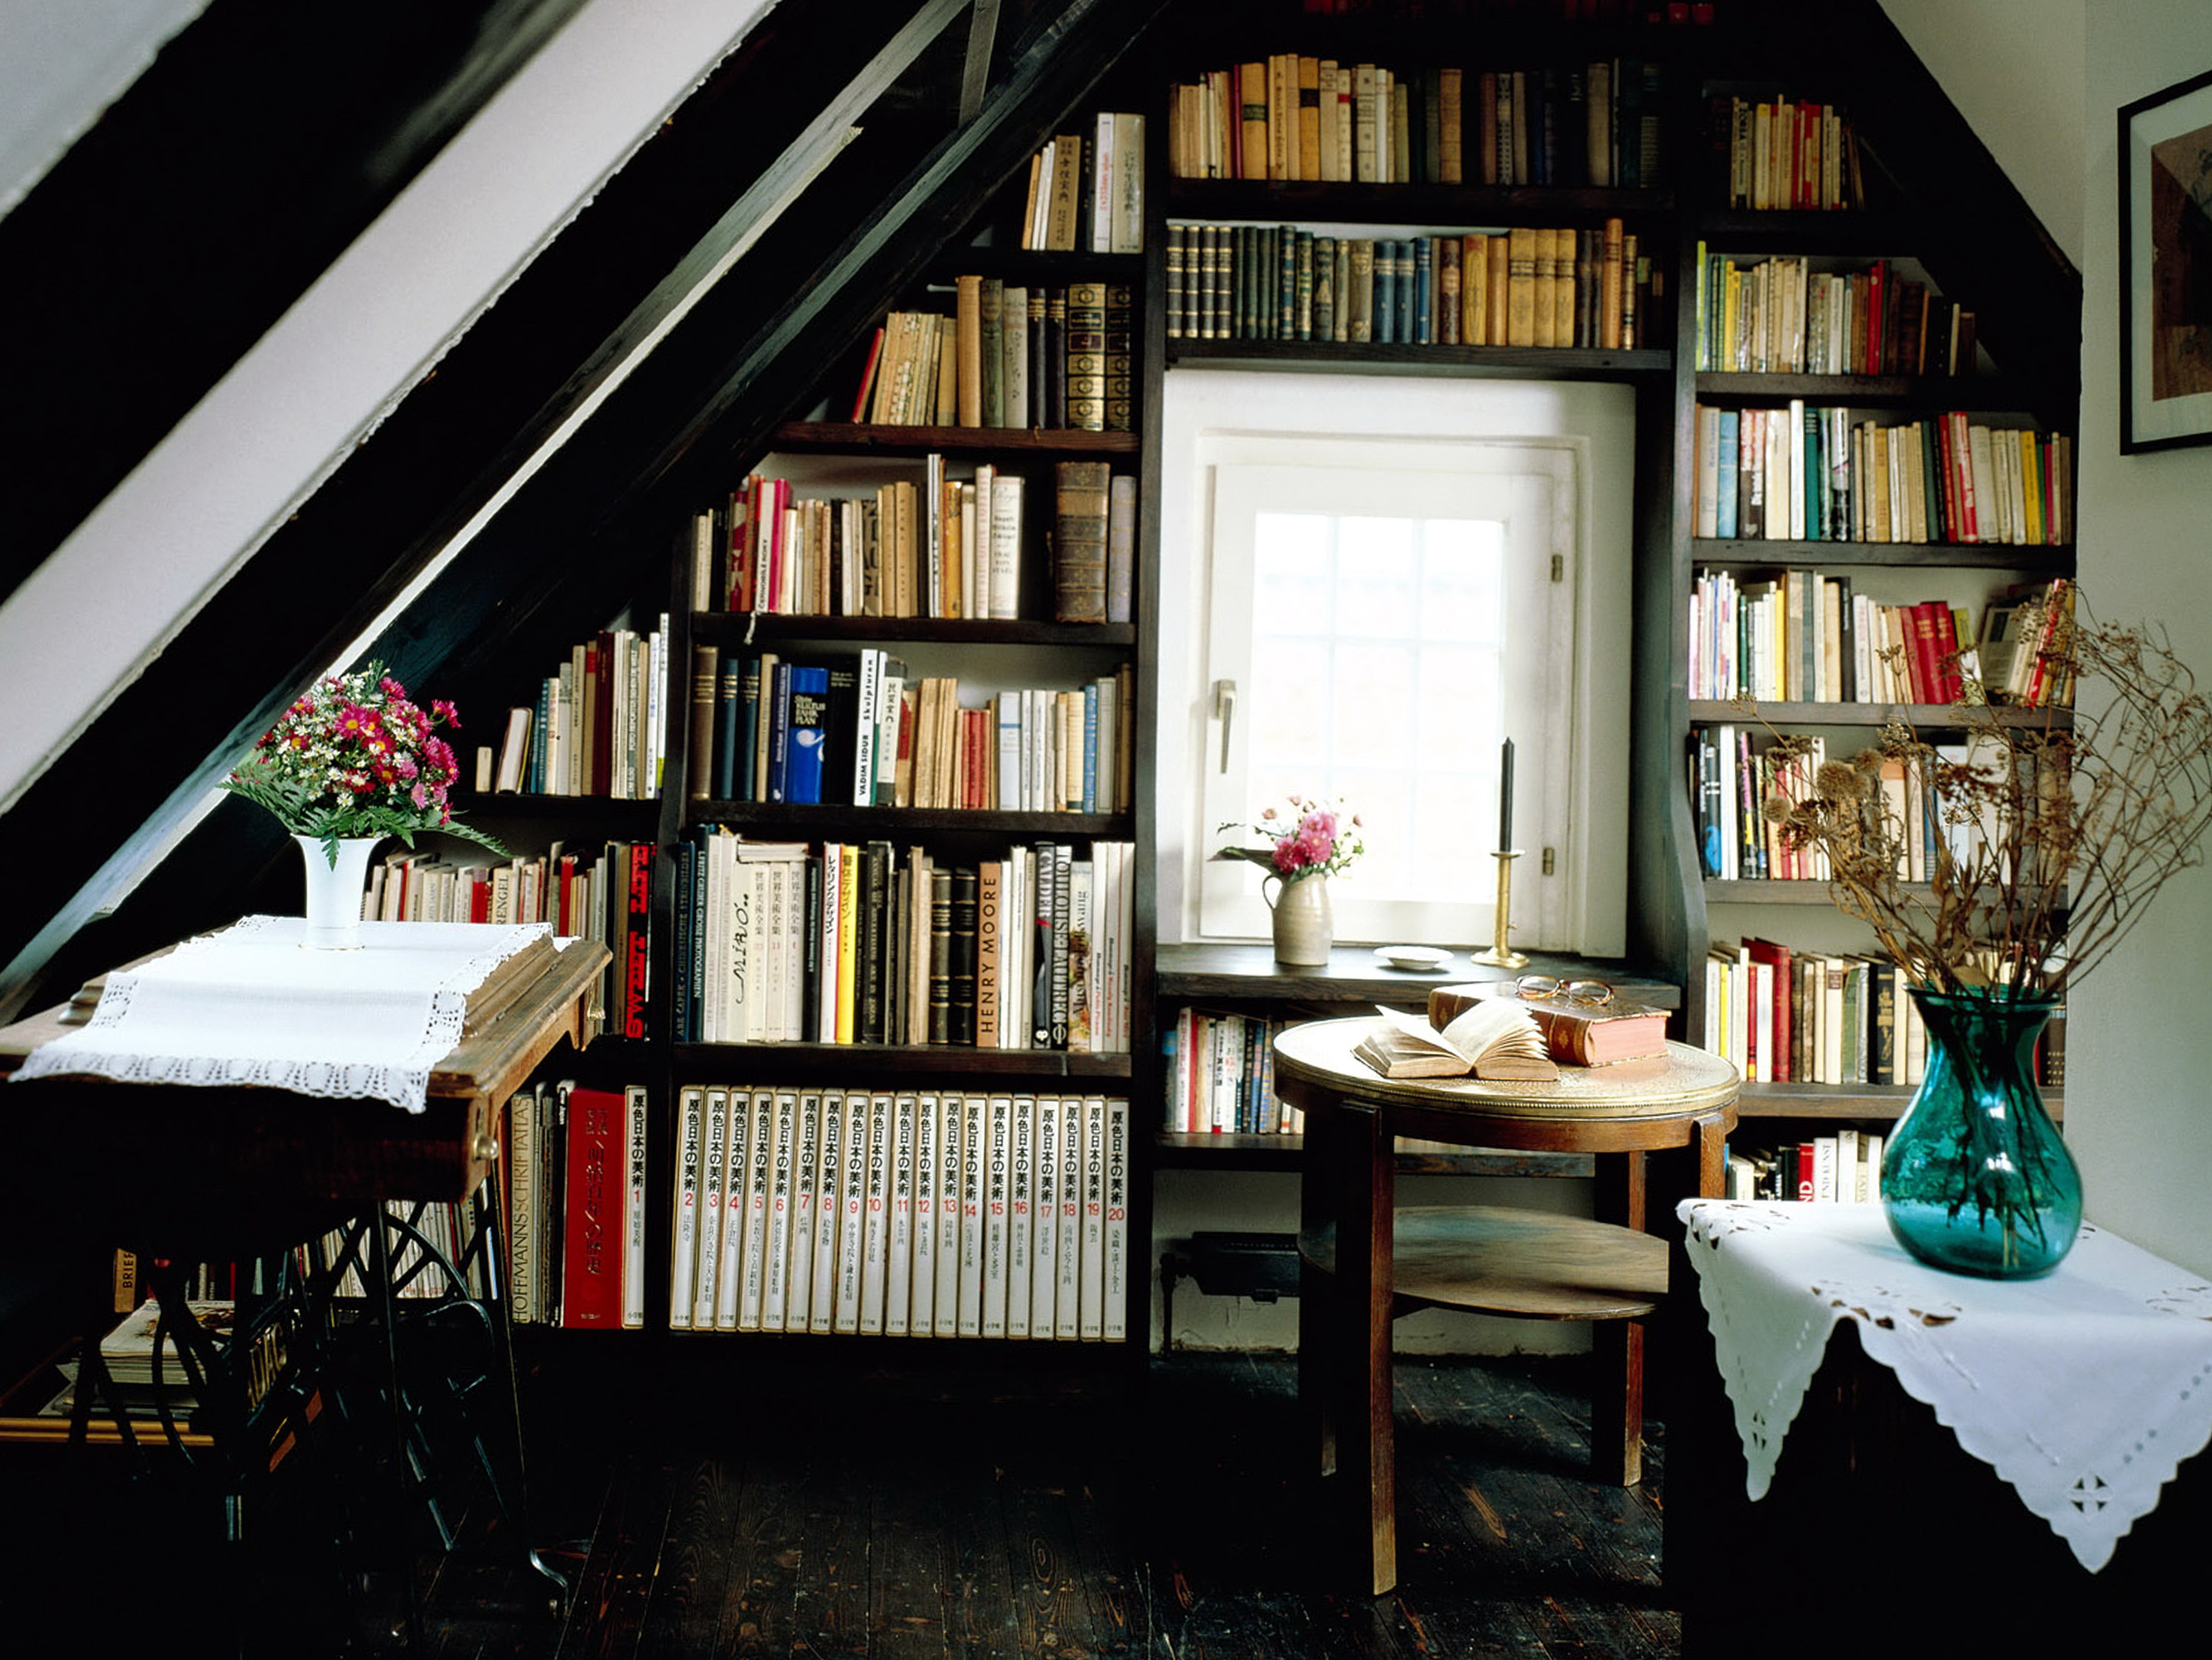 Built In Bookshelf Decorating Ideas   Home Design Ideas